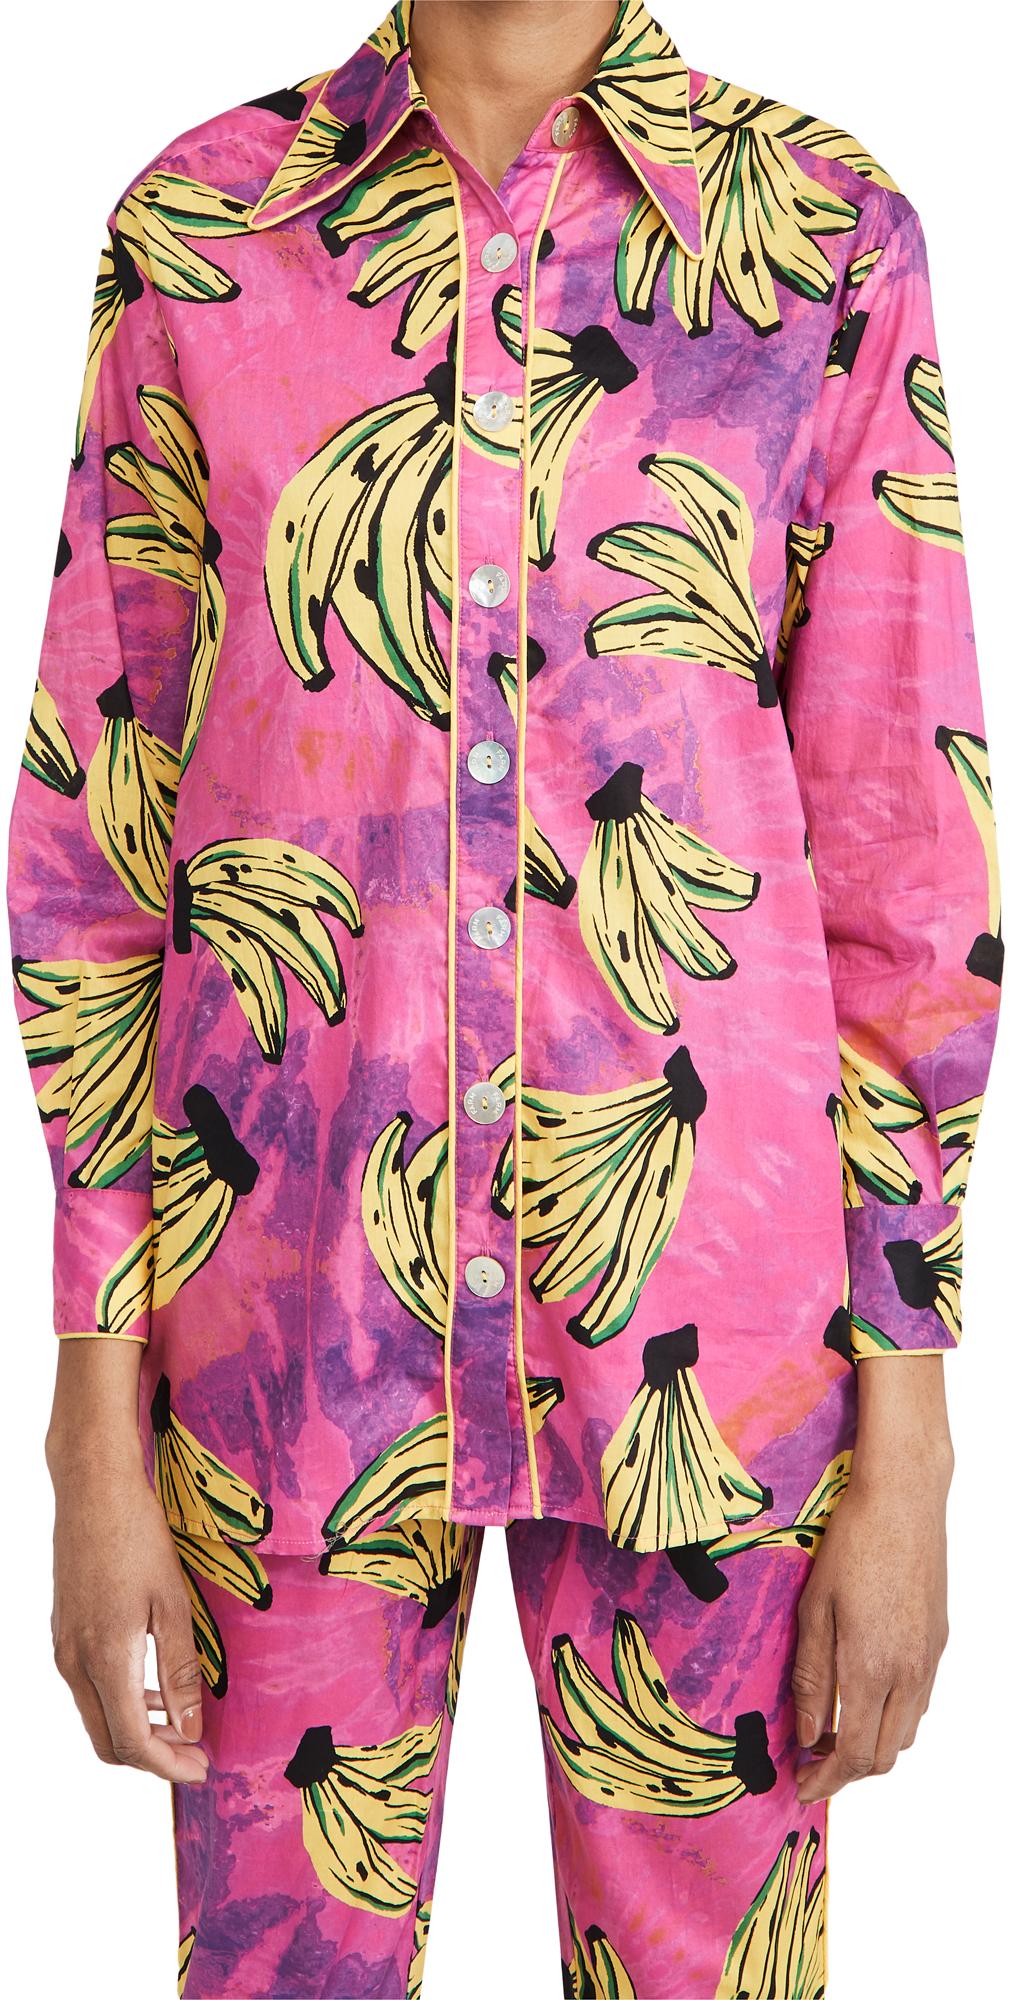 FARM Rio Tie Dye Bananas Pajama Shirt